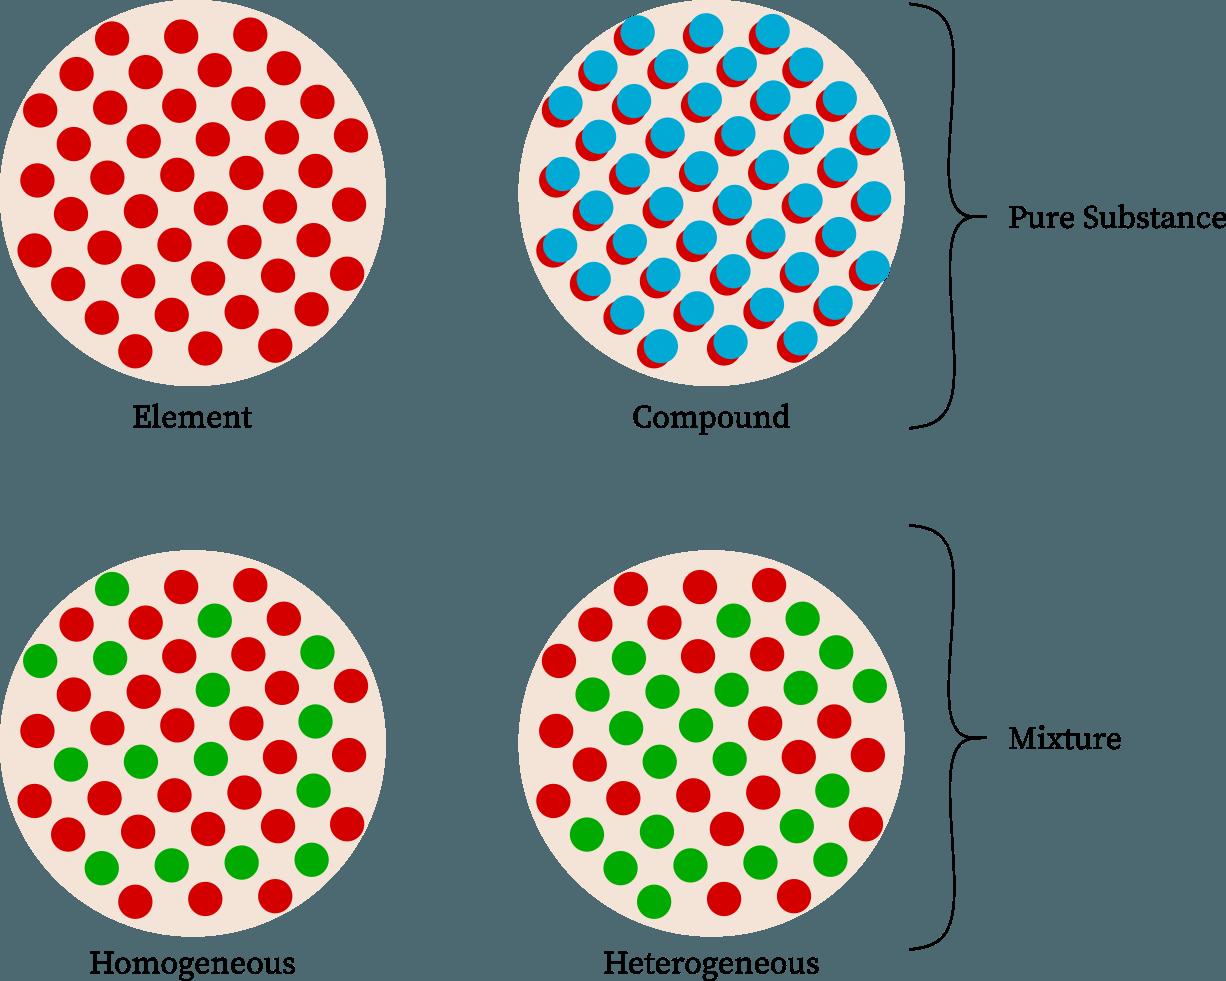 Is Table Salt A Compound Or Element Mixture